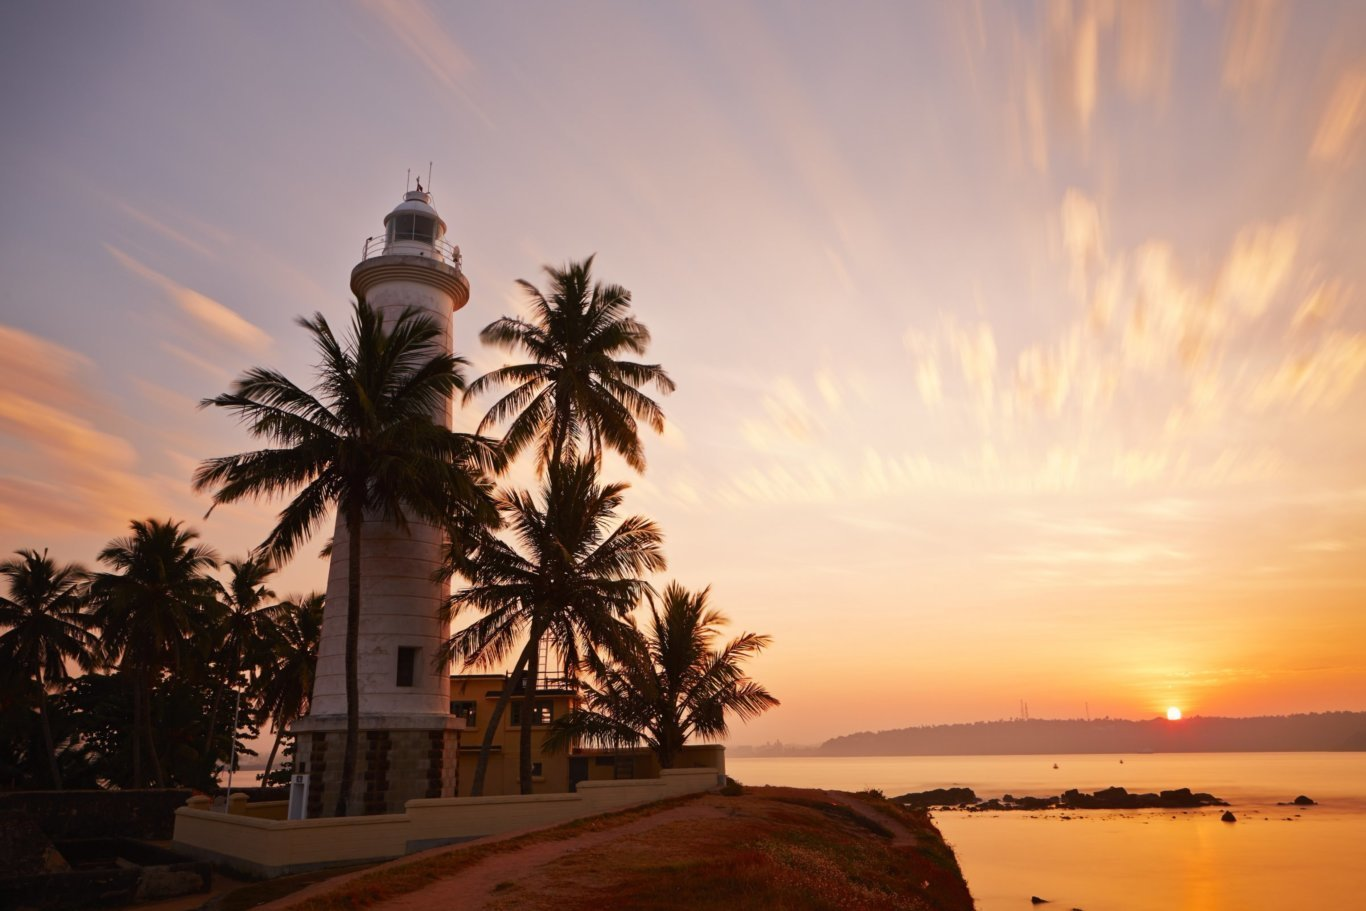 13-Day World Heritage Tour - Sri Lanka Itinerary